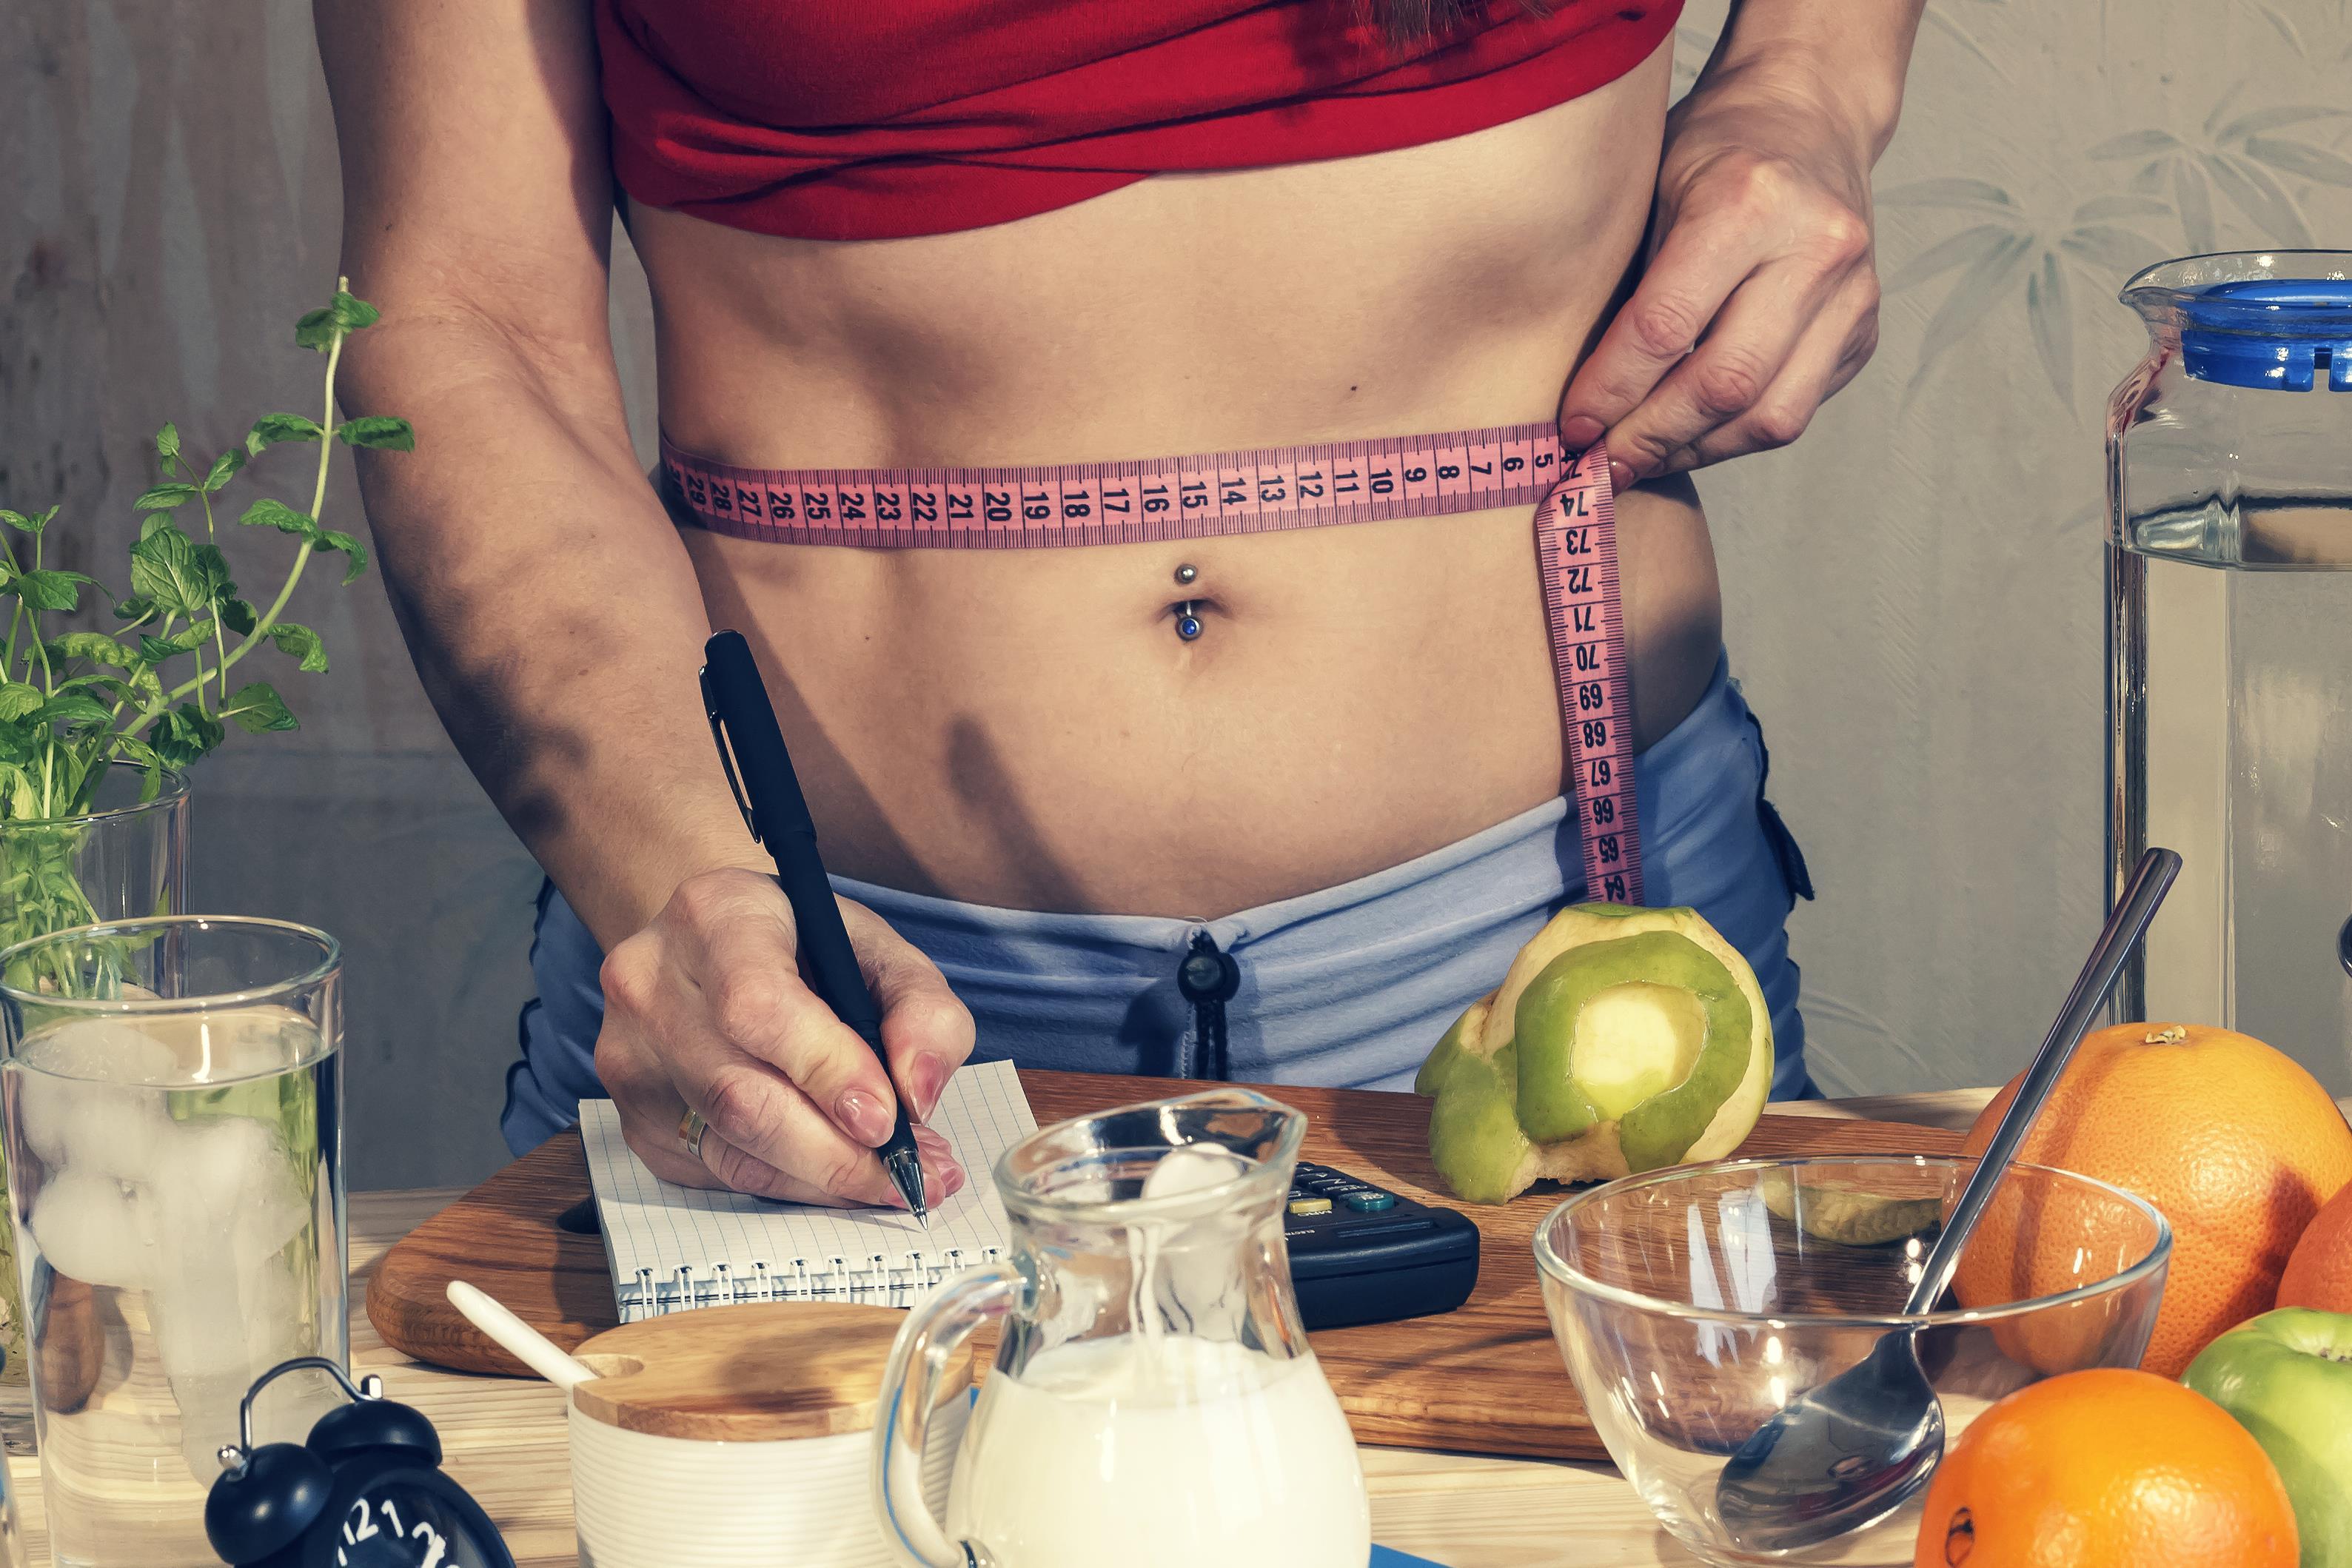 Ducan diéta és magas vérnyomás